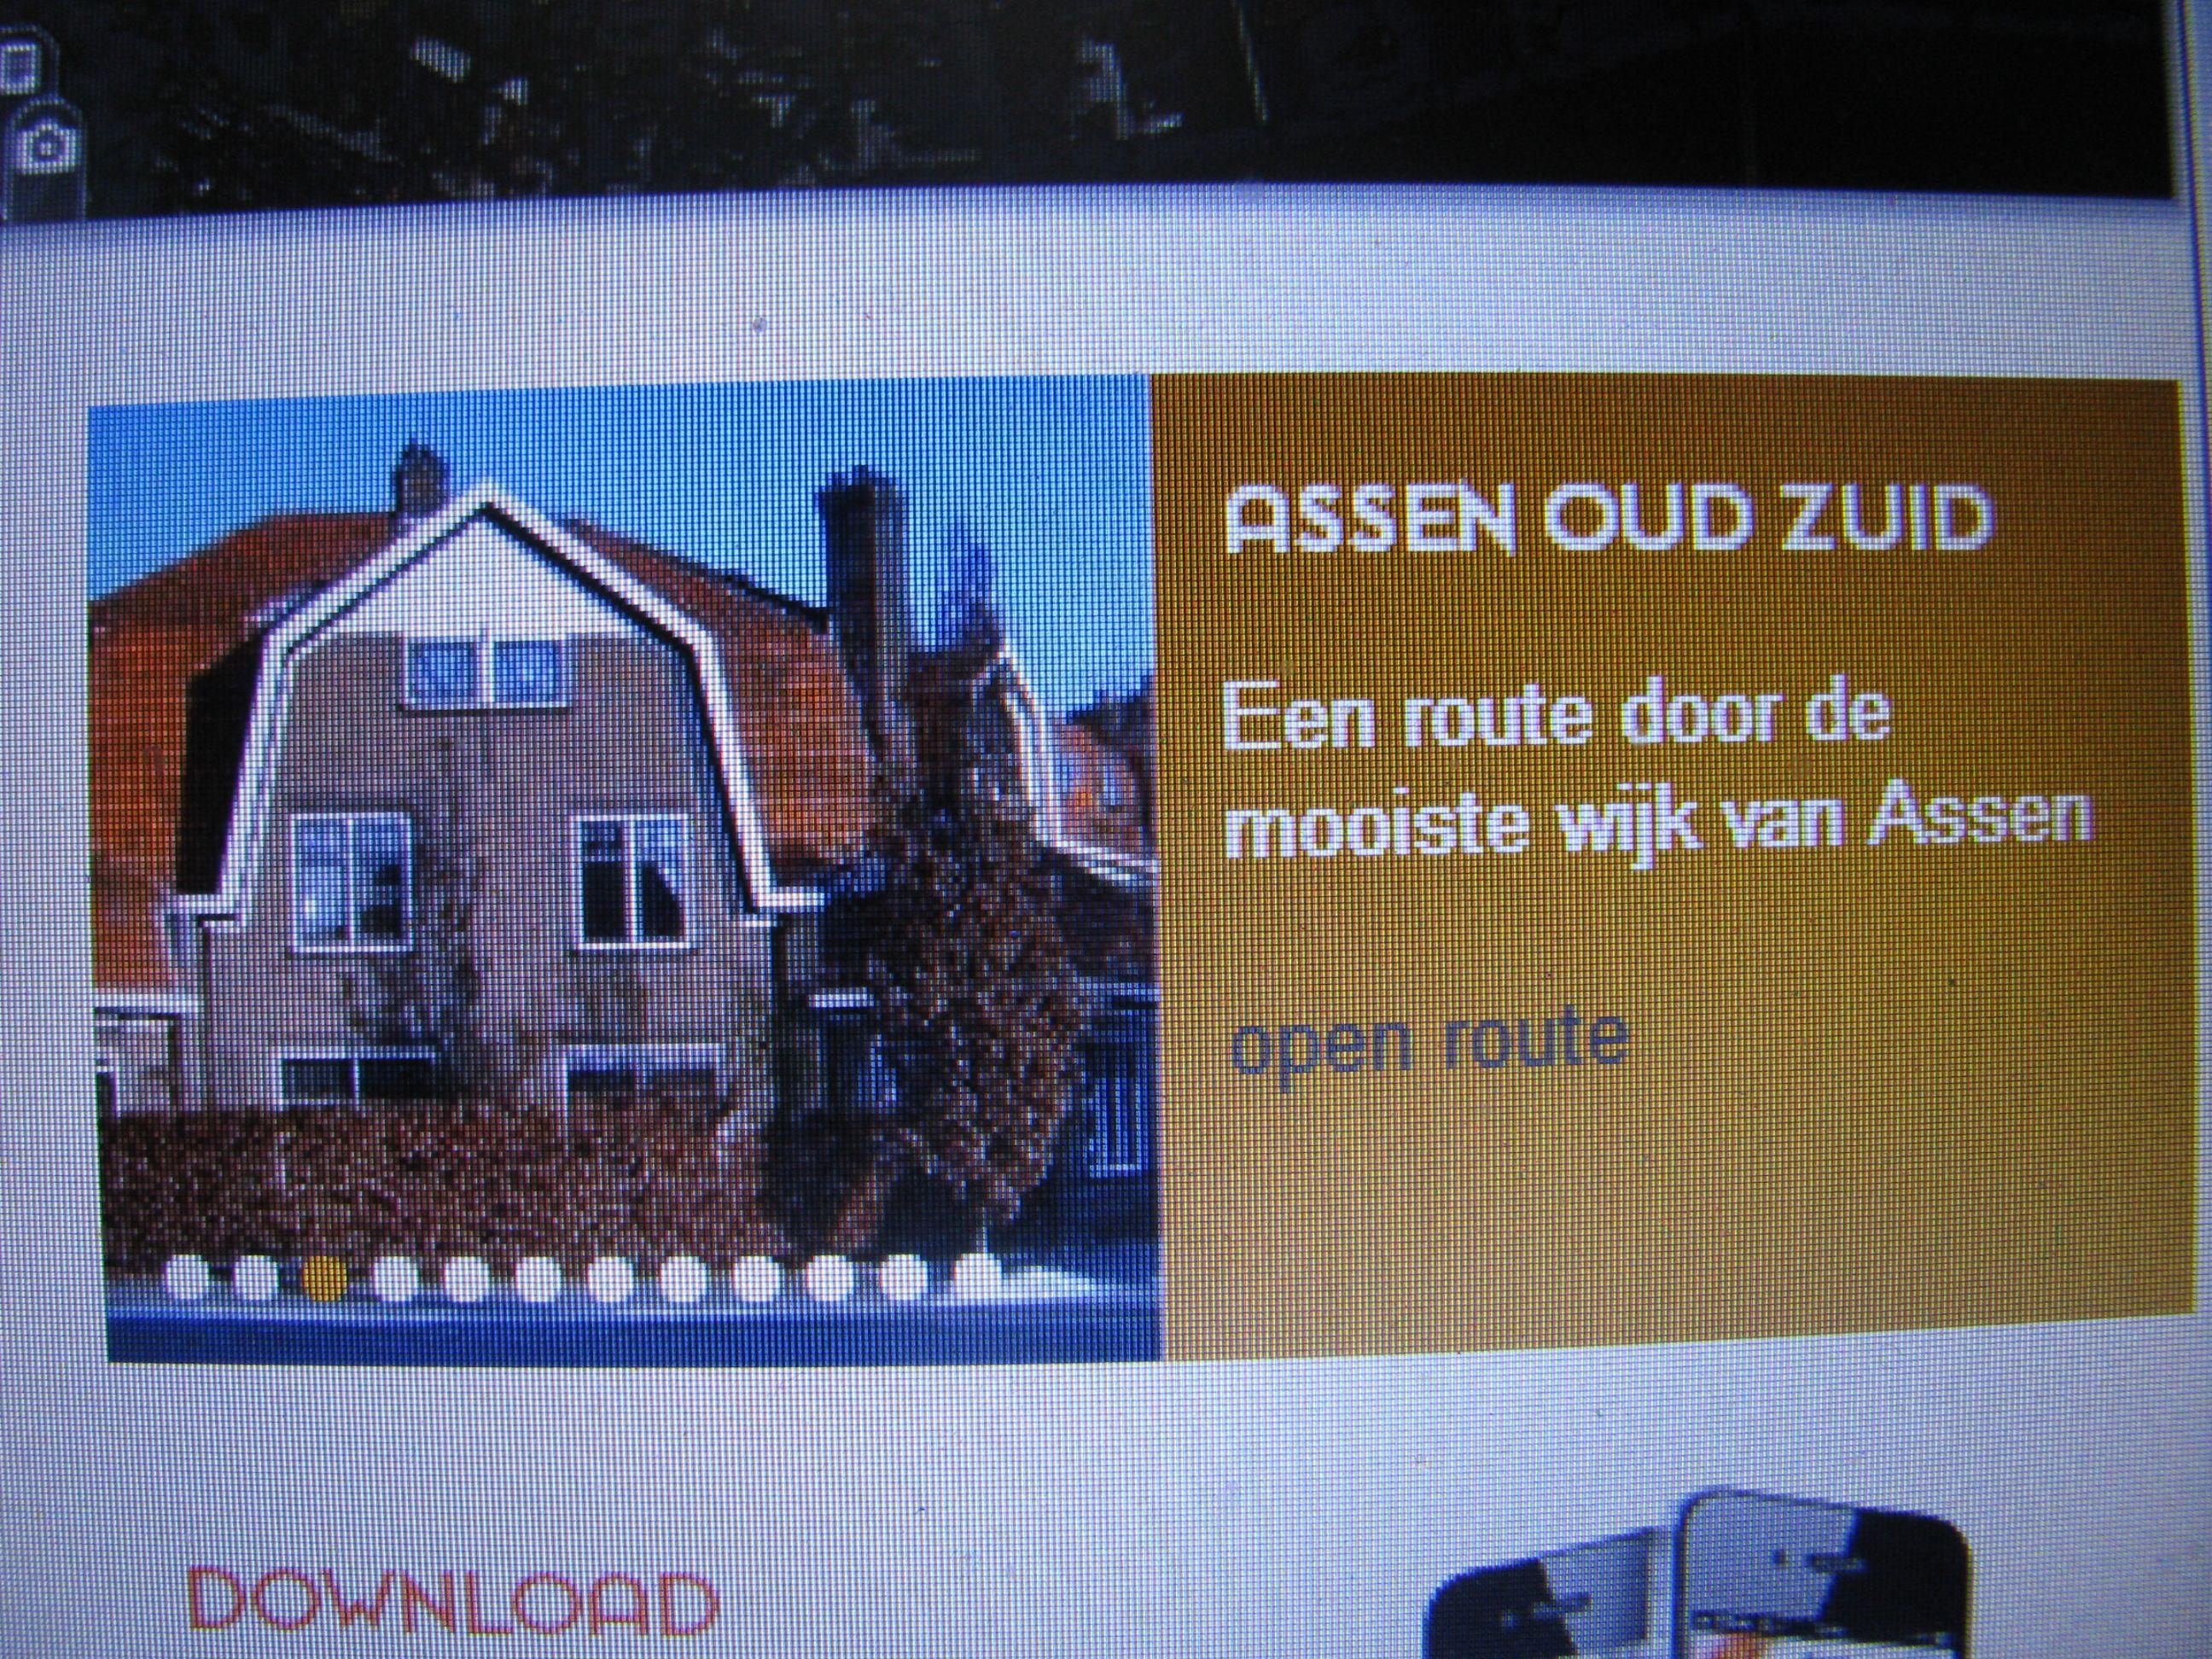 Wandelen in Assen oud zuid. kijk op Annodrenthe.nu